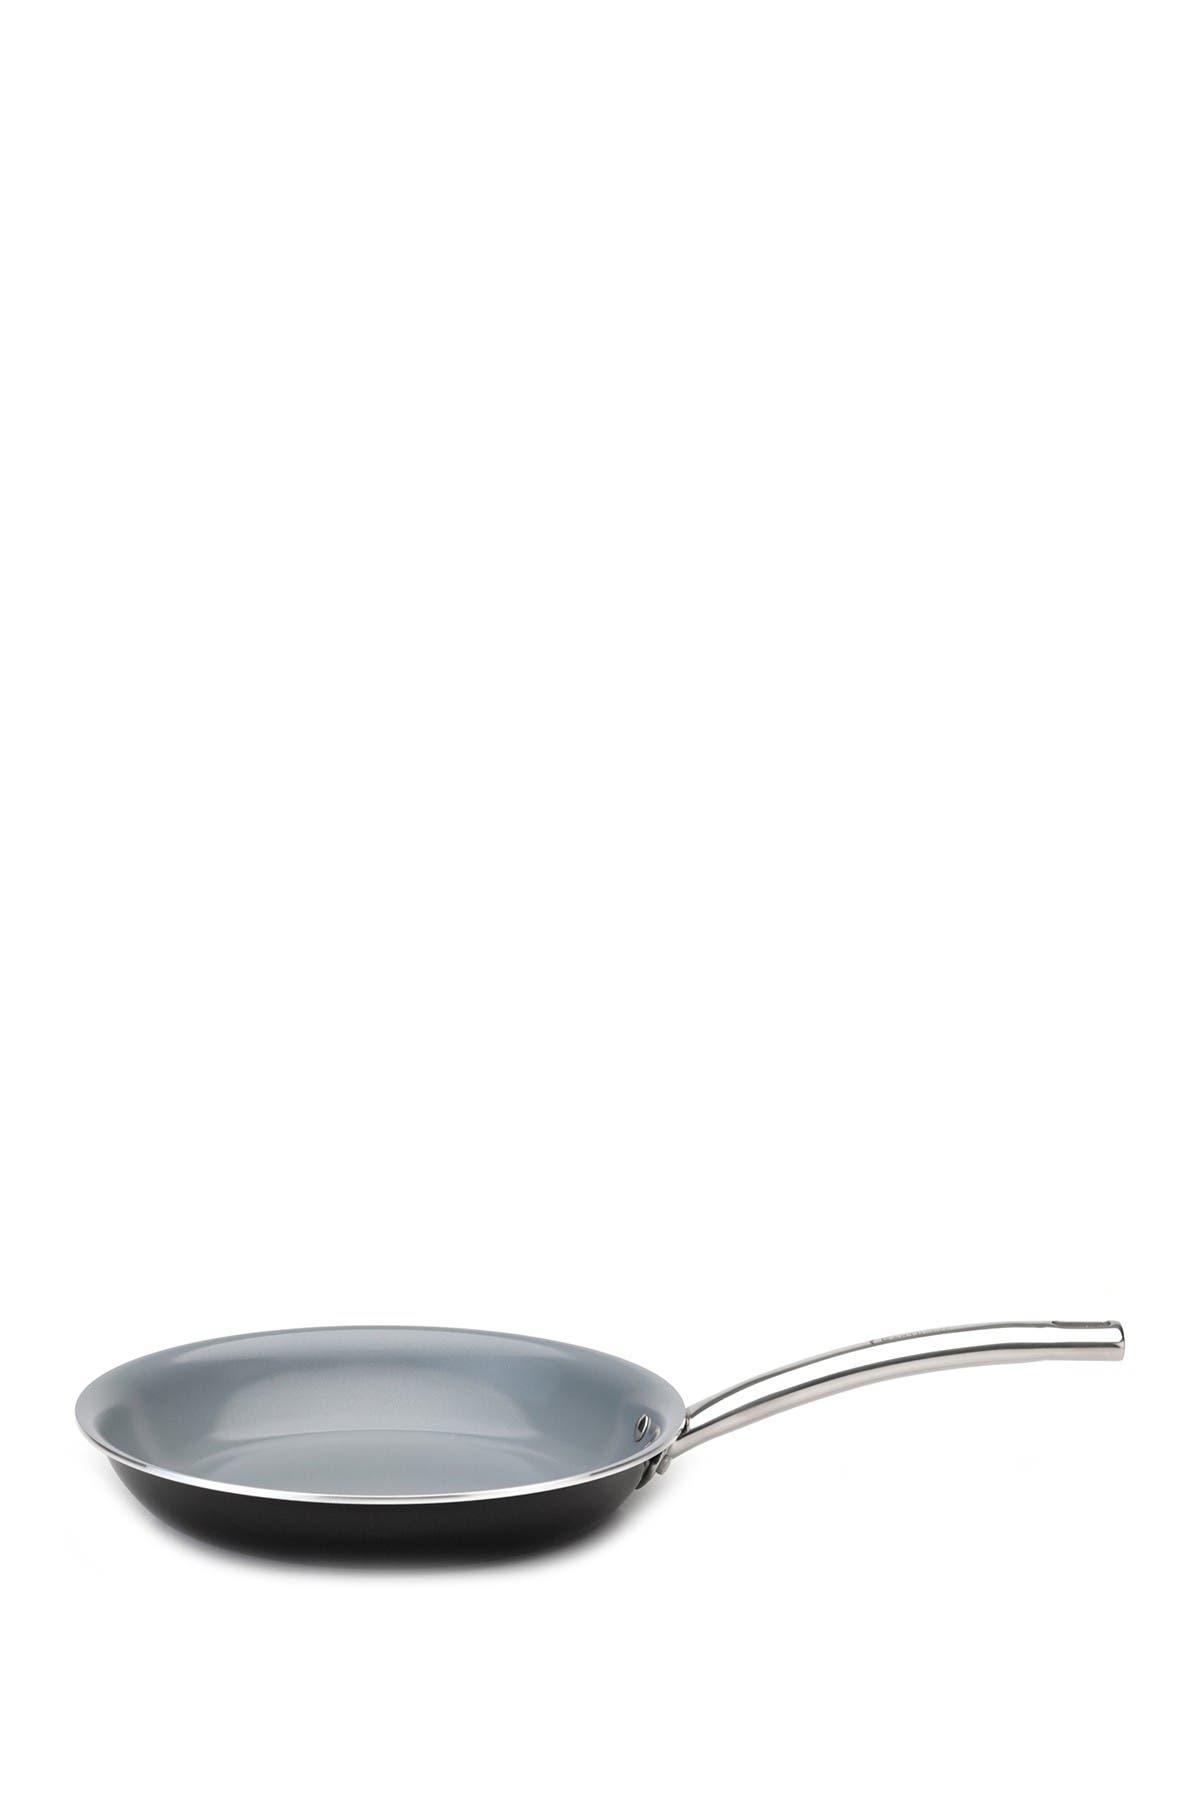 "Image of BergHOFF Black 10"" Ceramic Non-Stick Fry Pan"